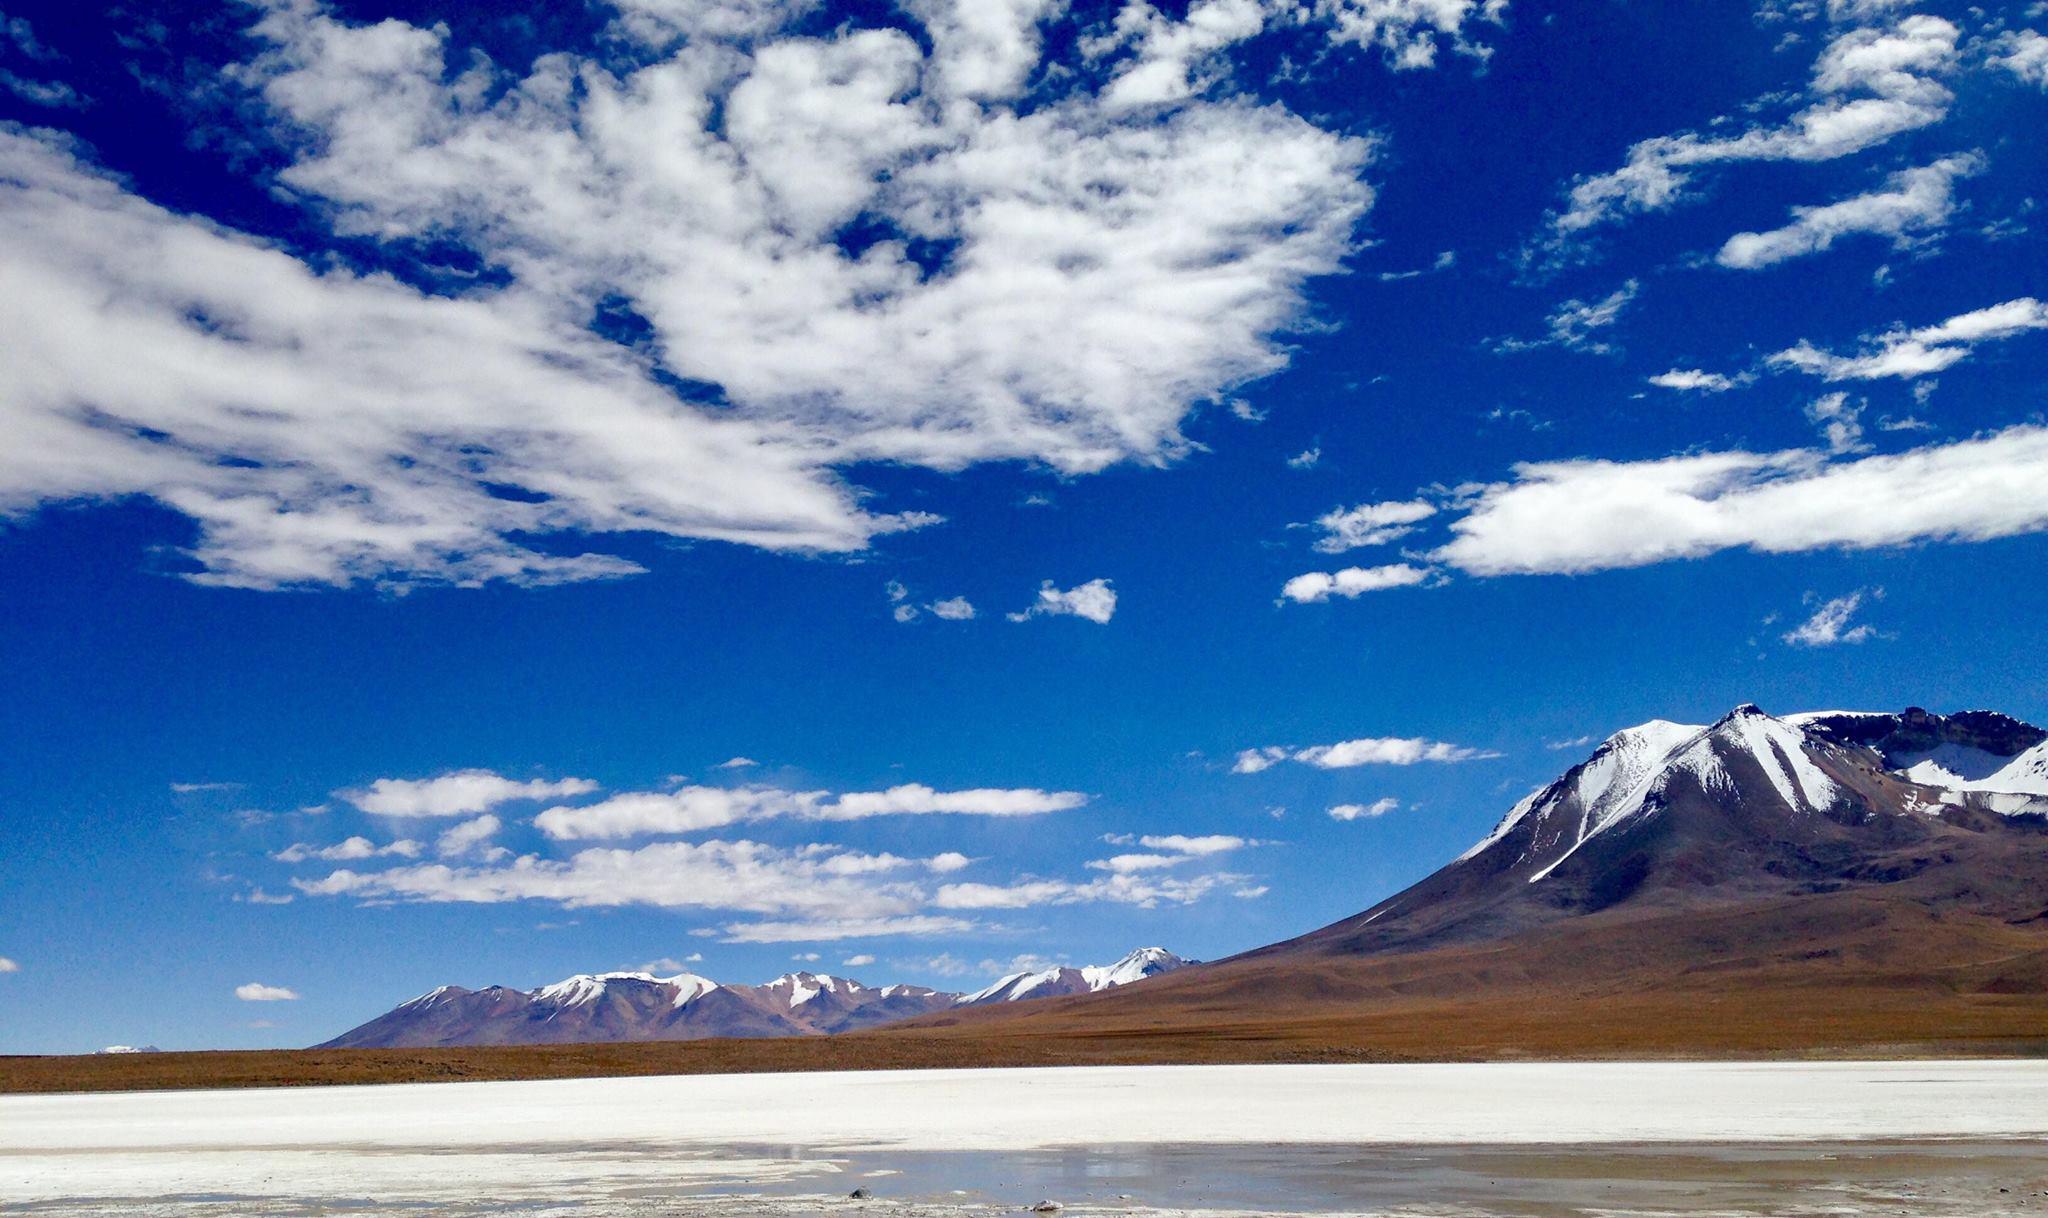 paysage bolivie pachamama lac sel salar uyuni